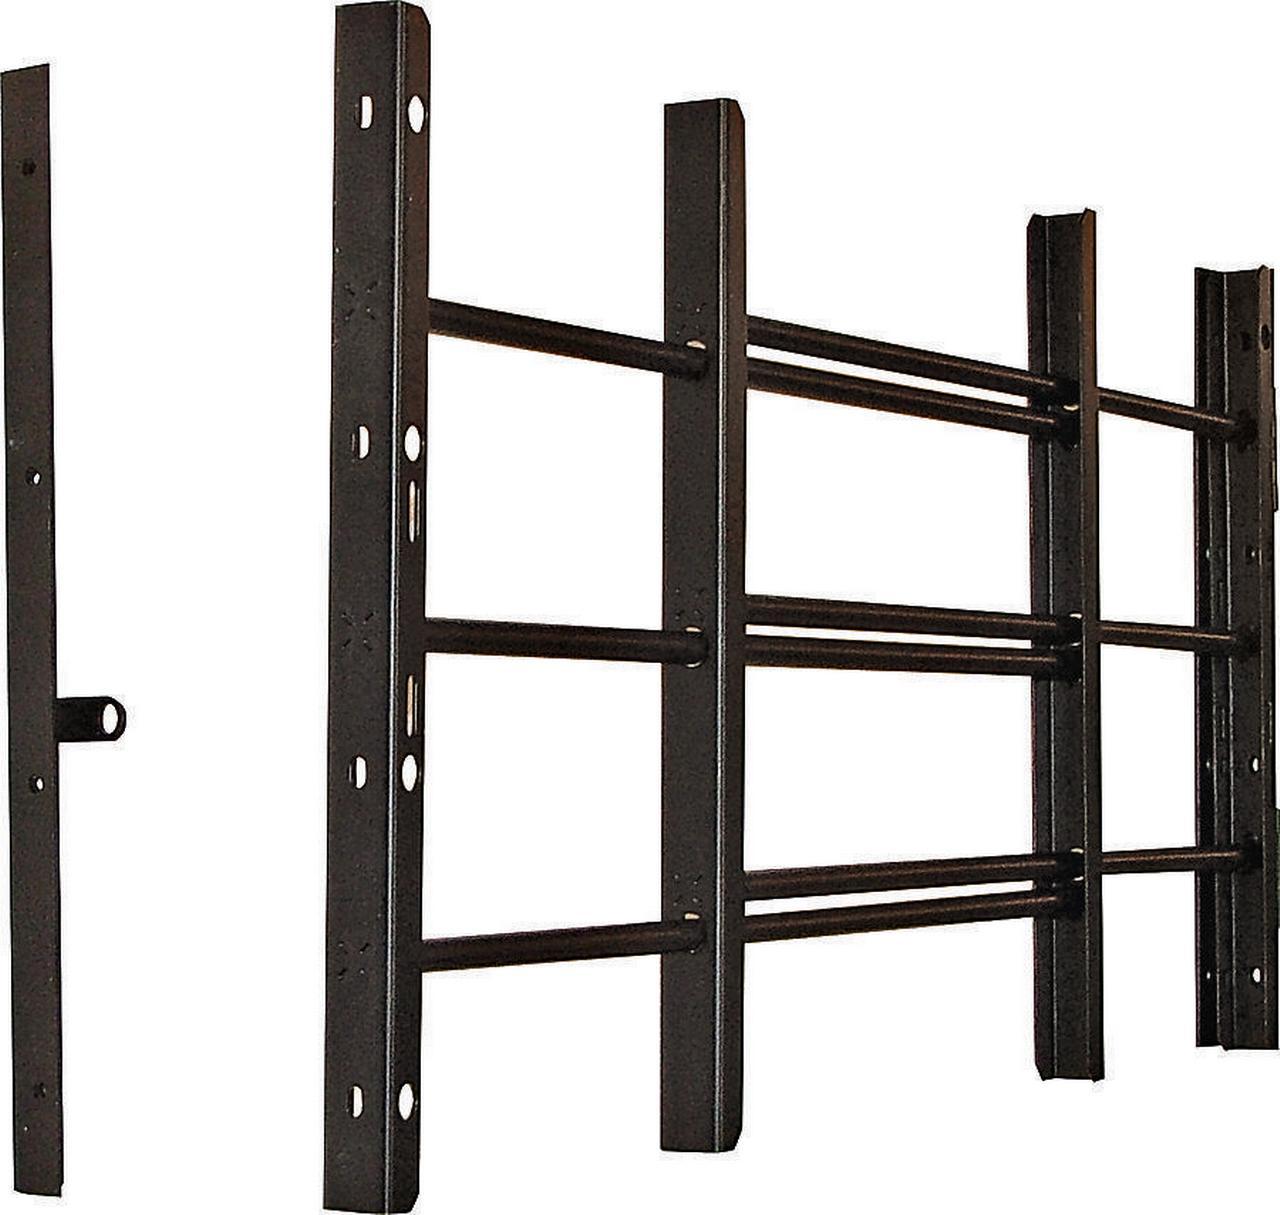 Grisham 93013 Horizontal Adjustable Window Guard, 22-3/4 in W x 14-3/4 in H, Solid Tubular Steel